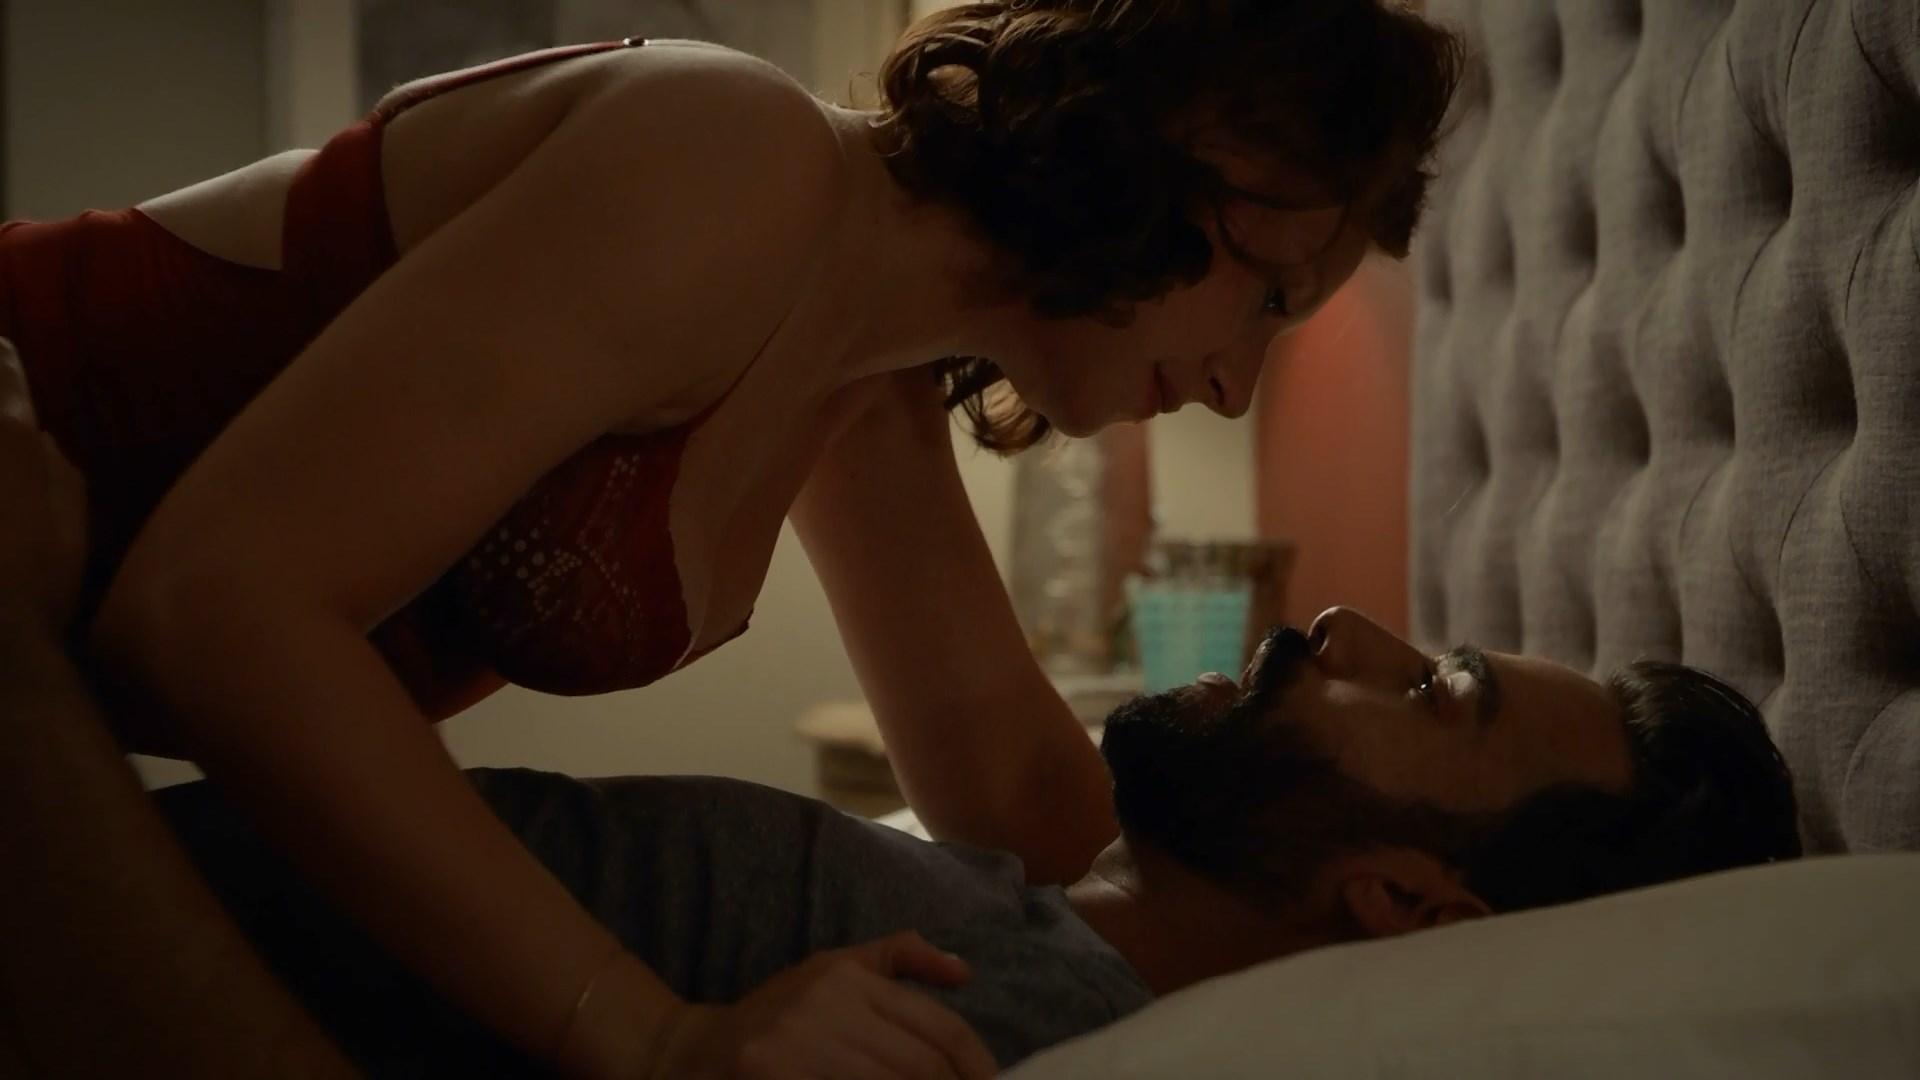 Aly Michalka Porn watch online - aly michalka - izombie s05e02 (2019) hd 1080p